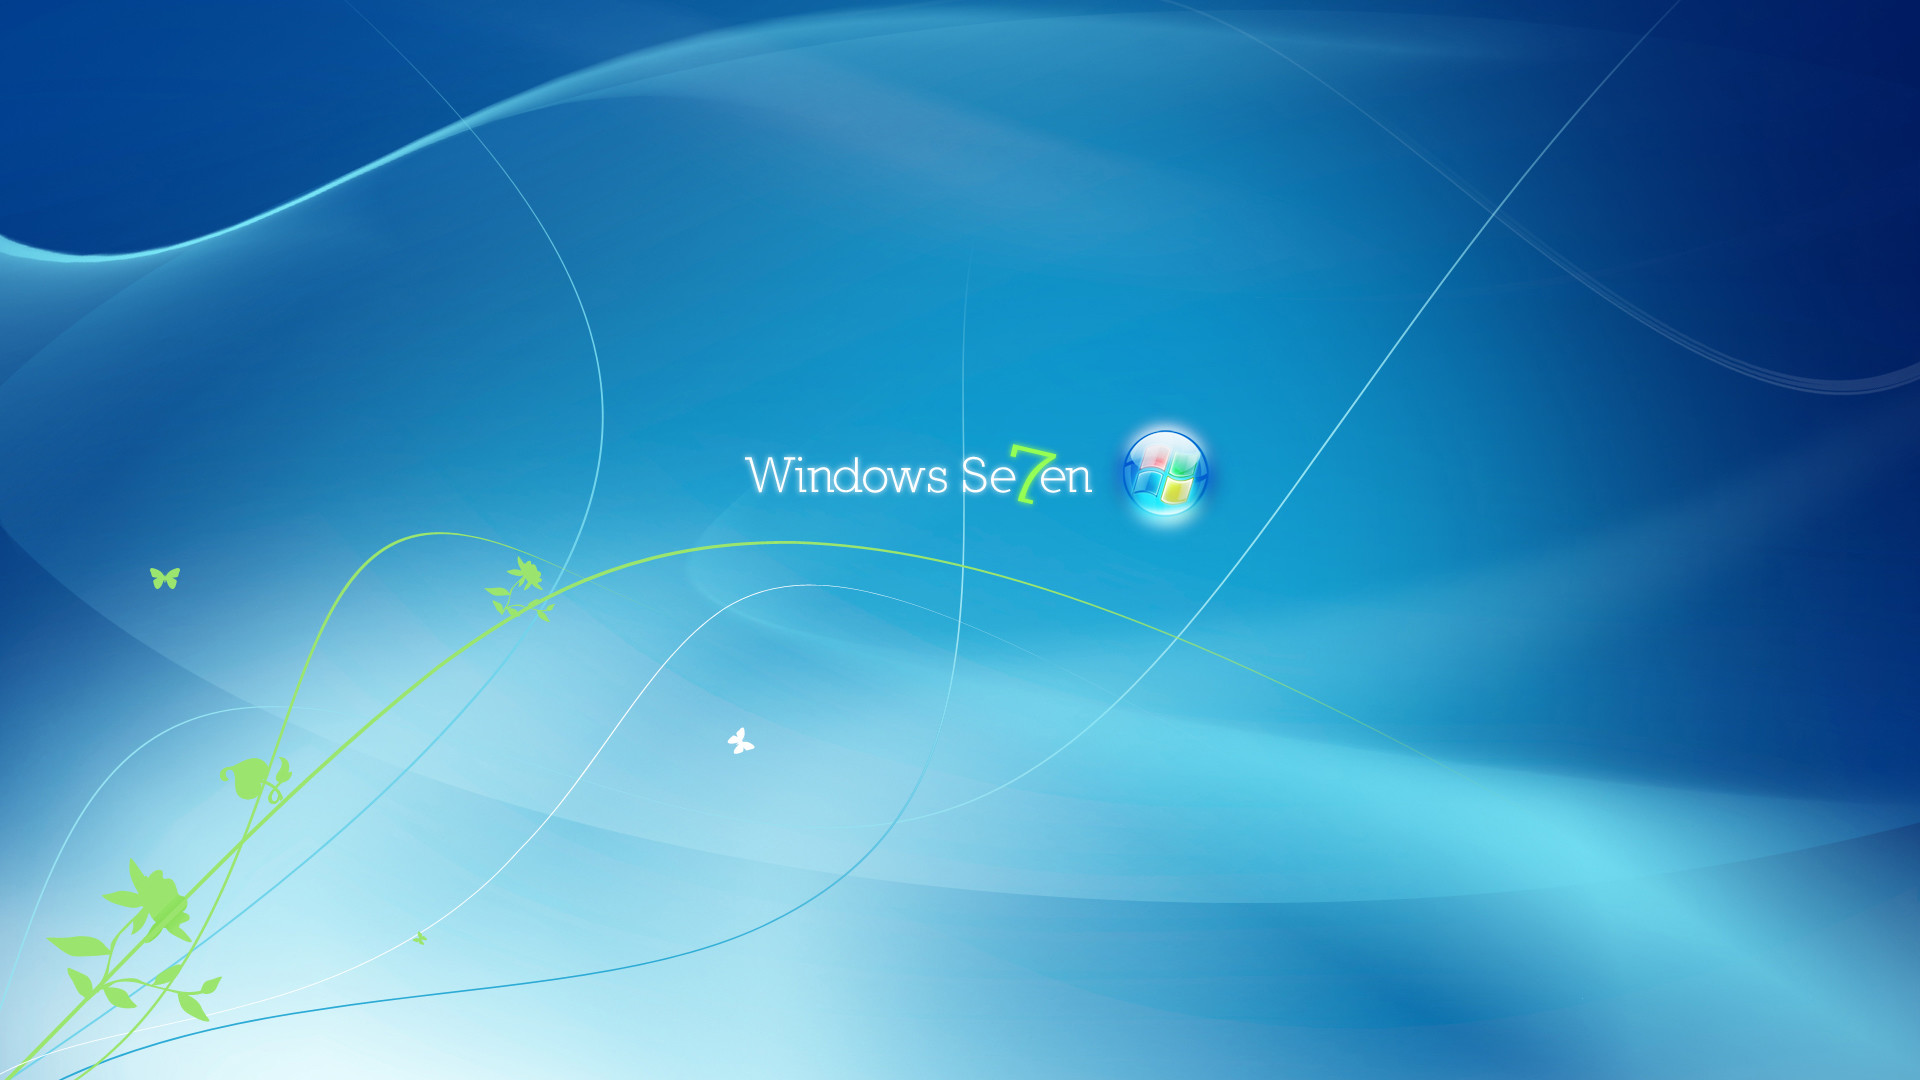 Windows Seven HD 1080p Wallpapers   HD Wallpapers